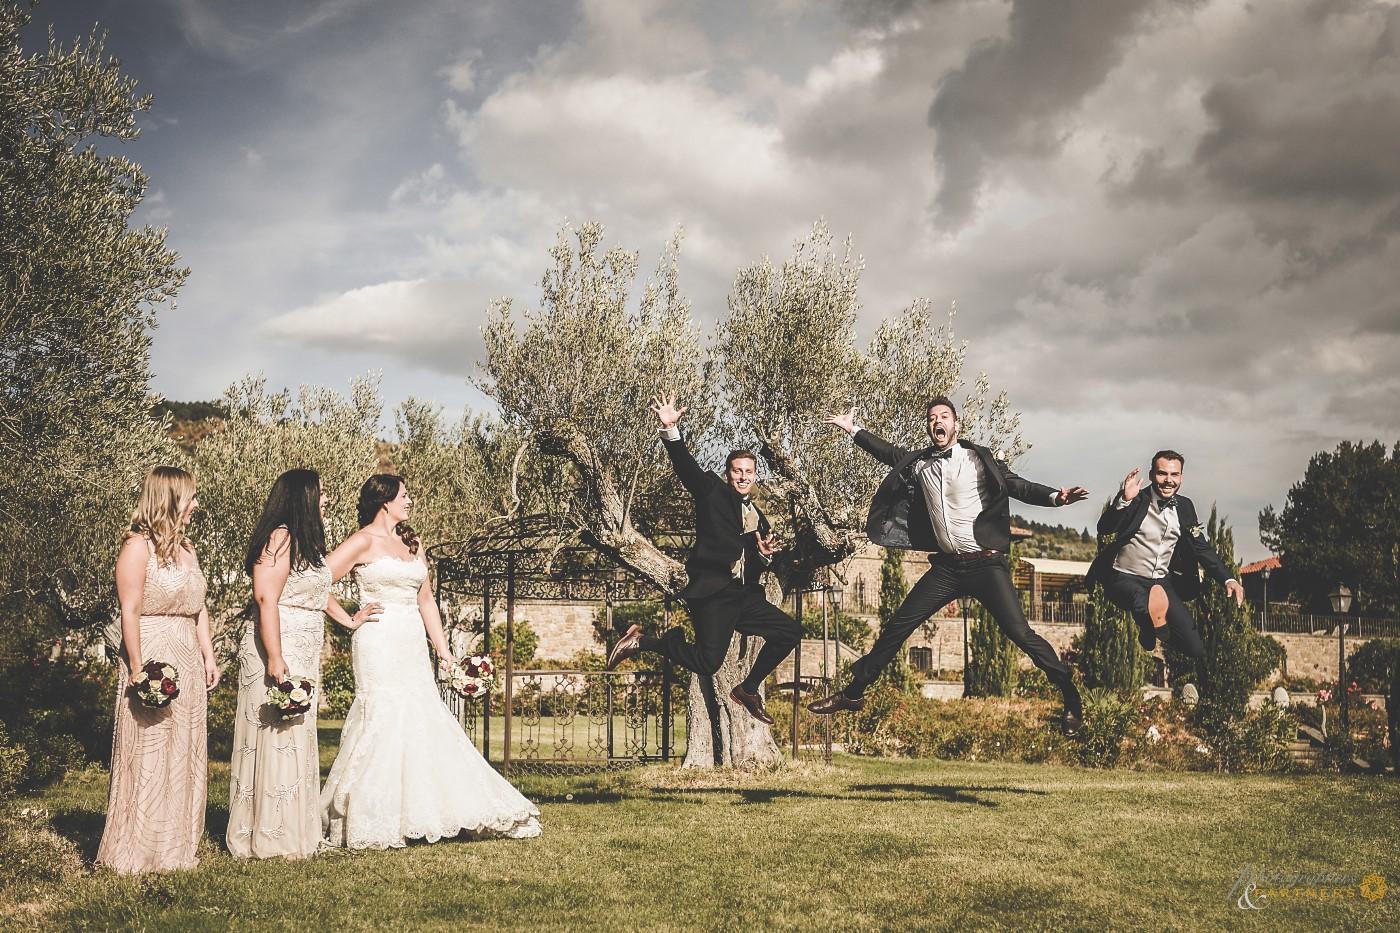 wedding_photography_villa_baroncino_15.jpg